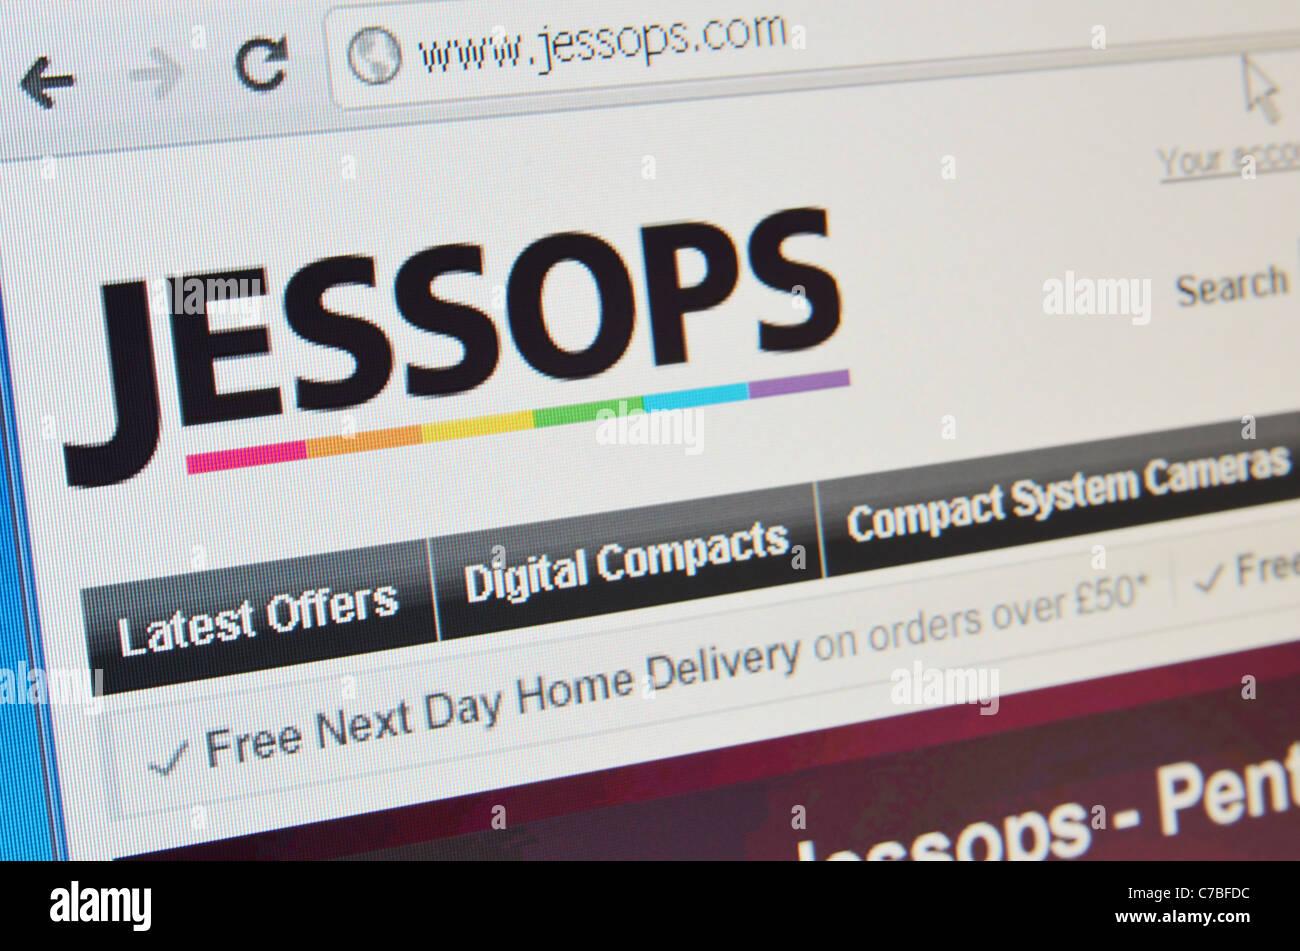 Jessops website screenshot - Stock Image